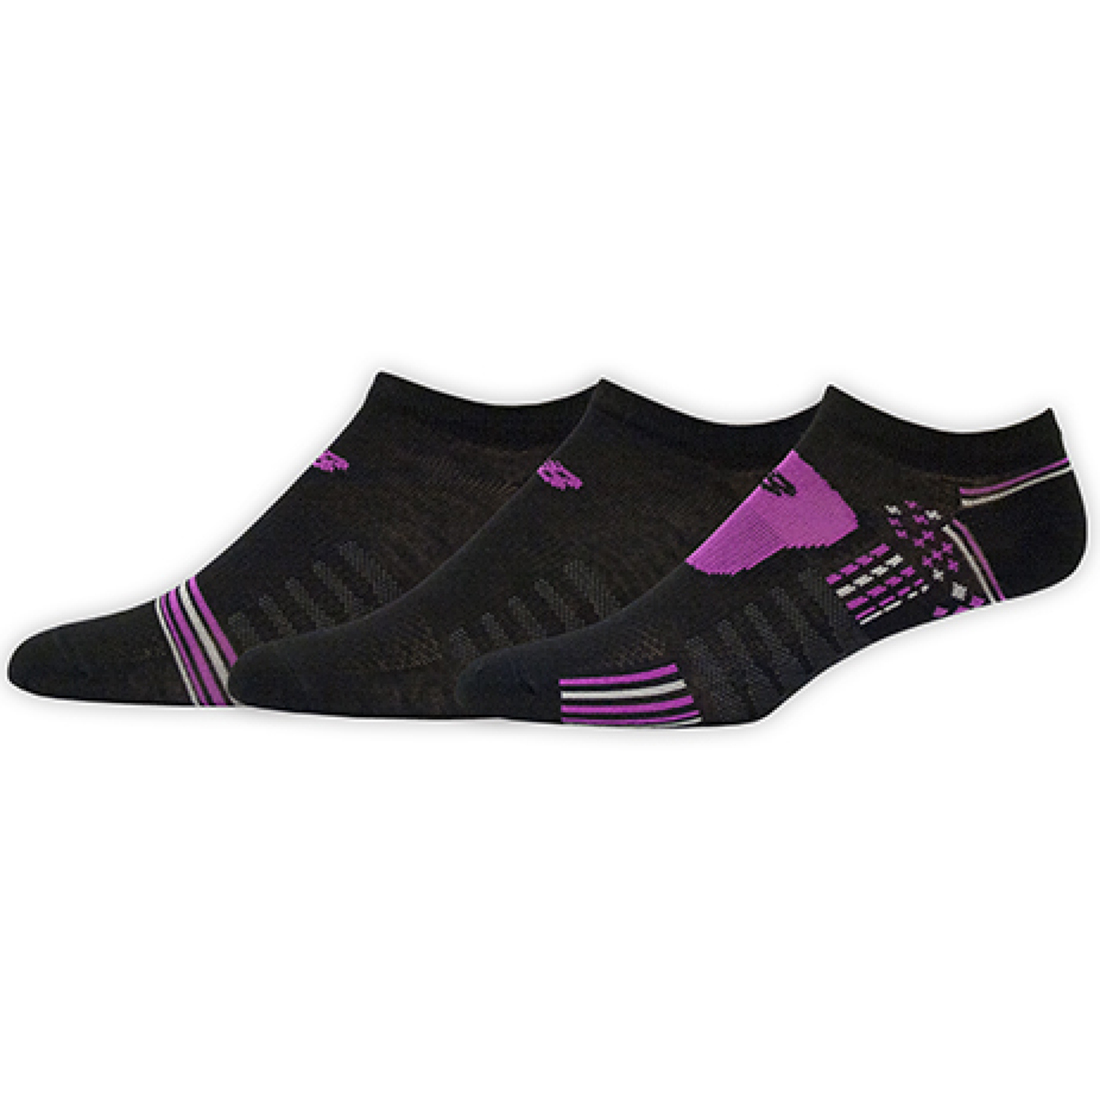 New Balance Womens Socks - Walmart.com